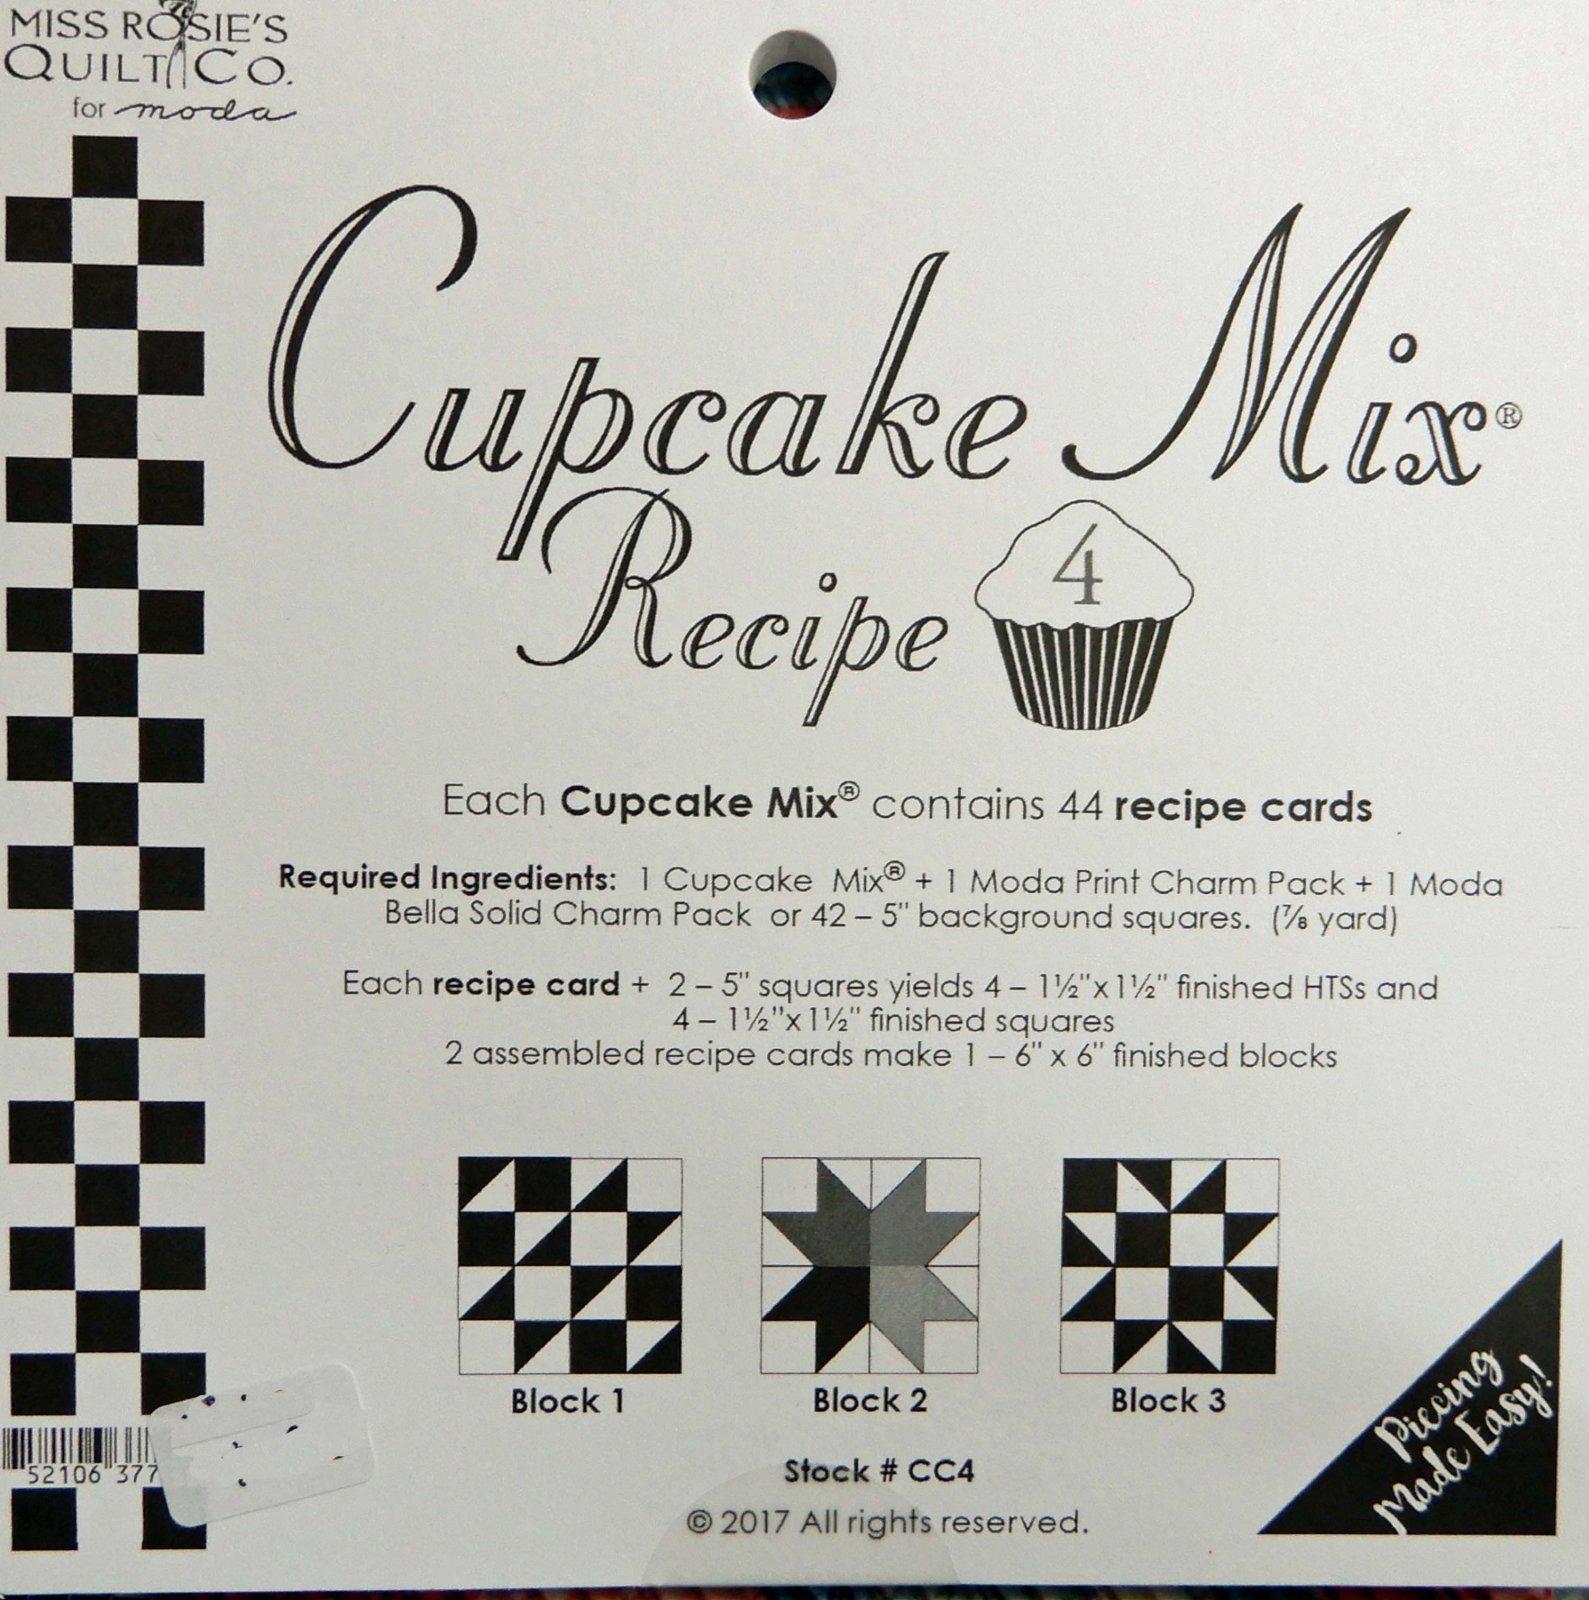 Cupcake Recipe volume 4